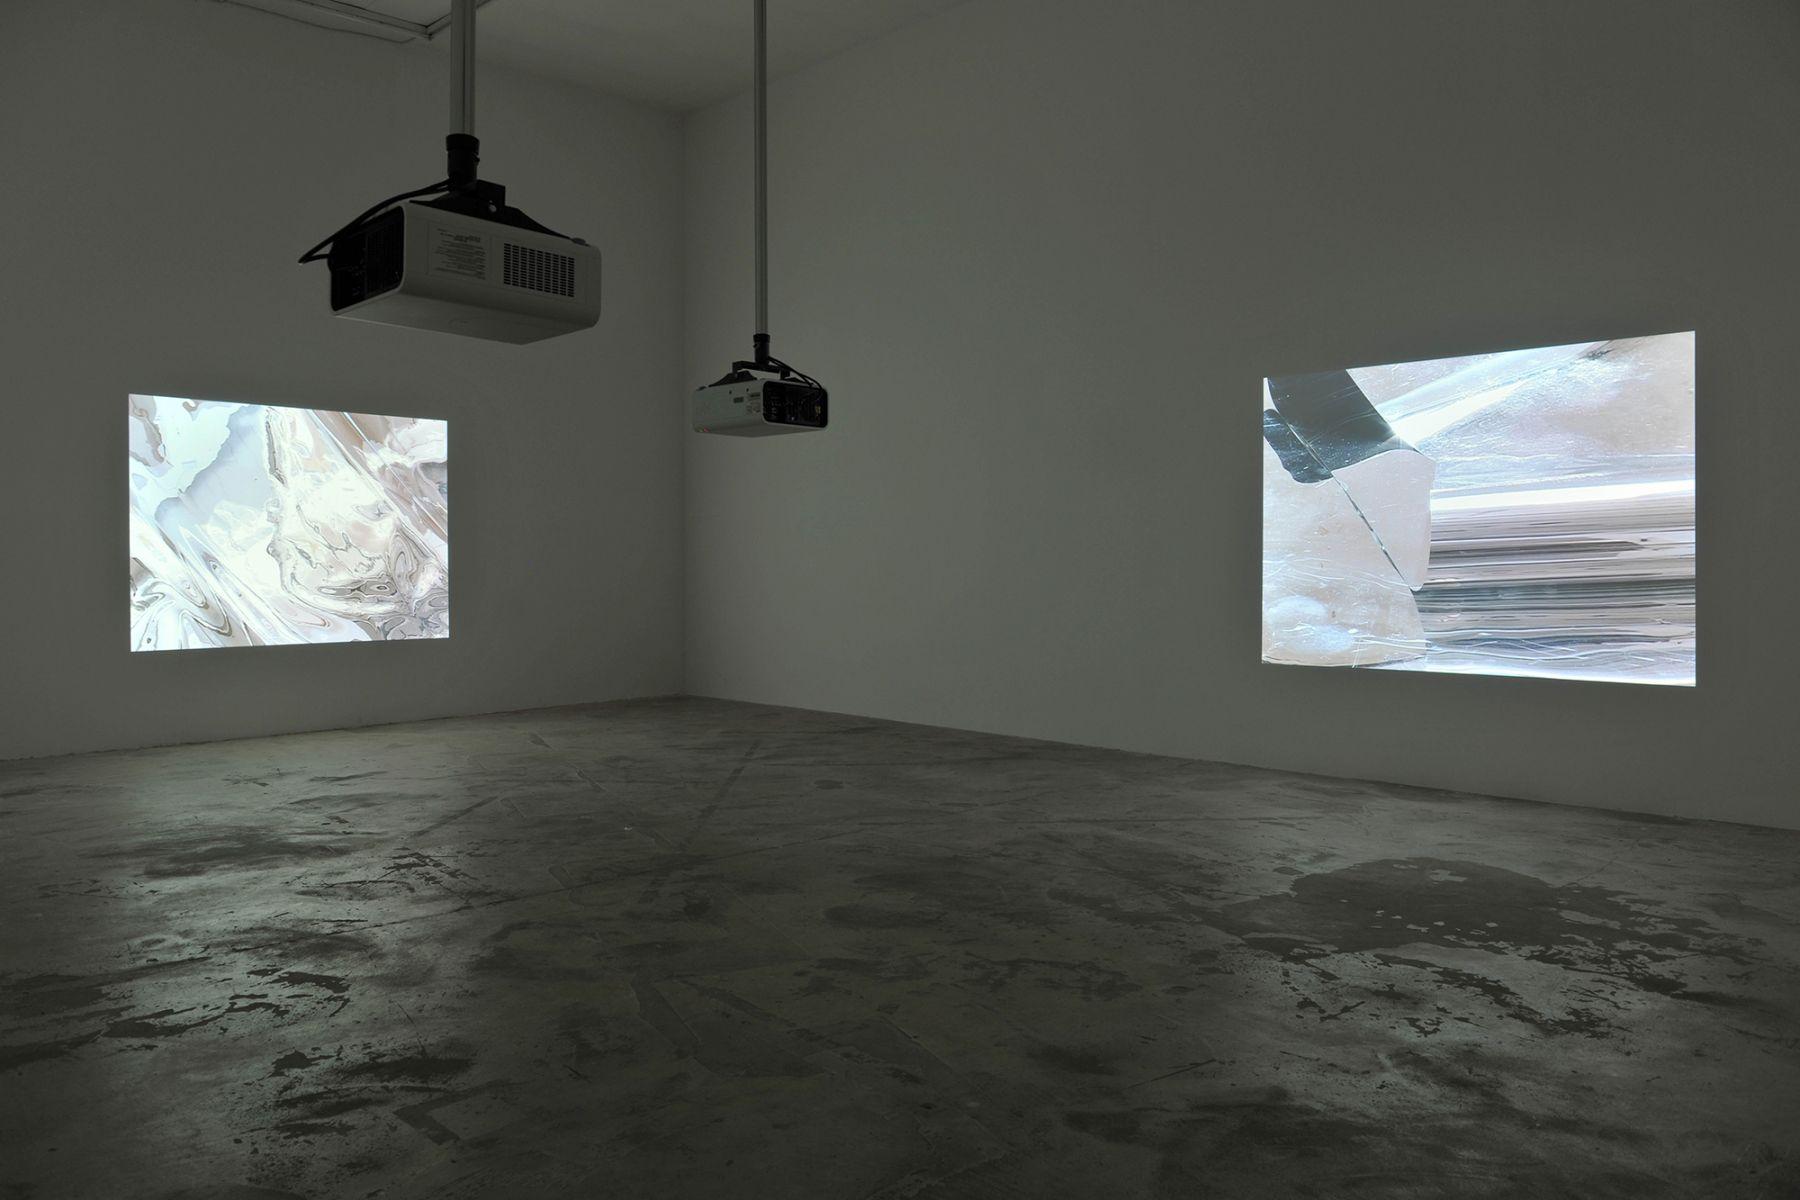 Installation view, Hilary Lloyd, Le Consortium, Dijon, 2009